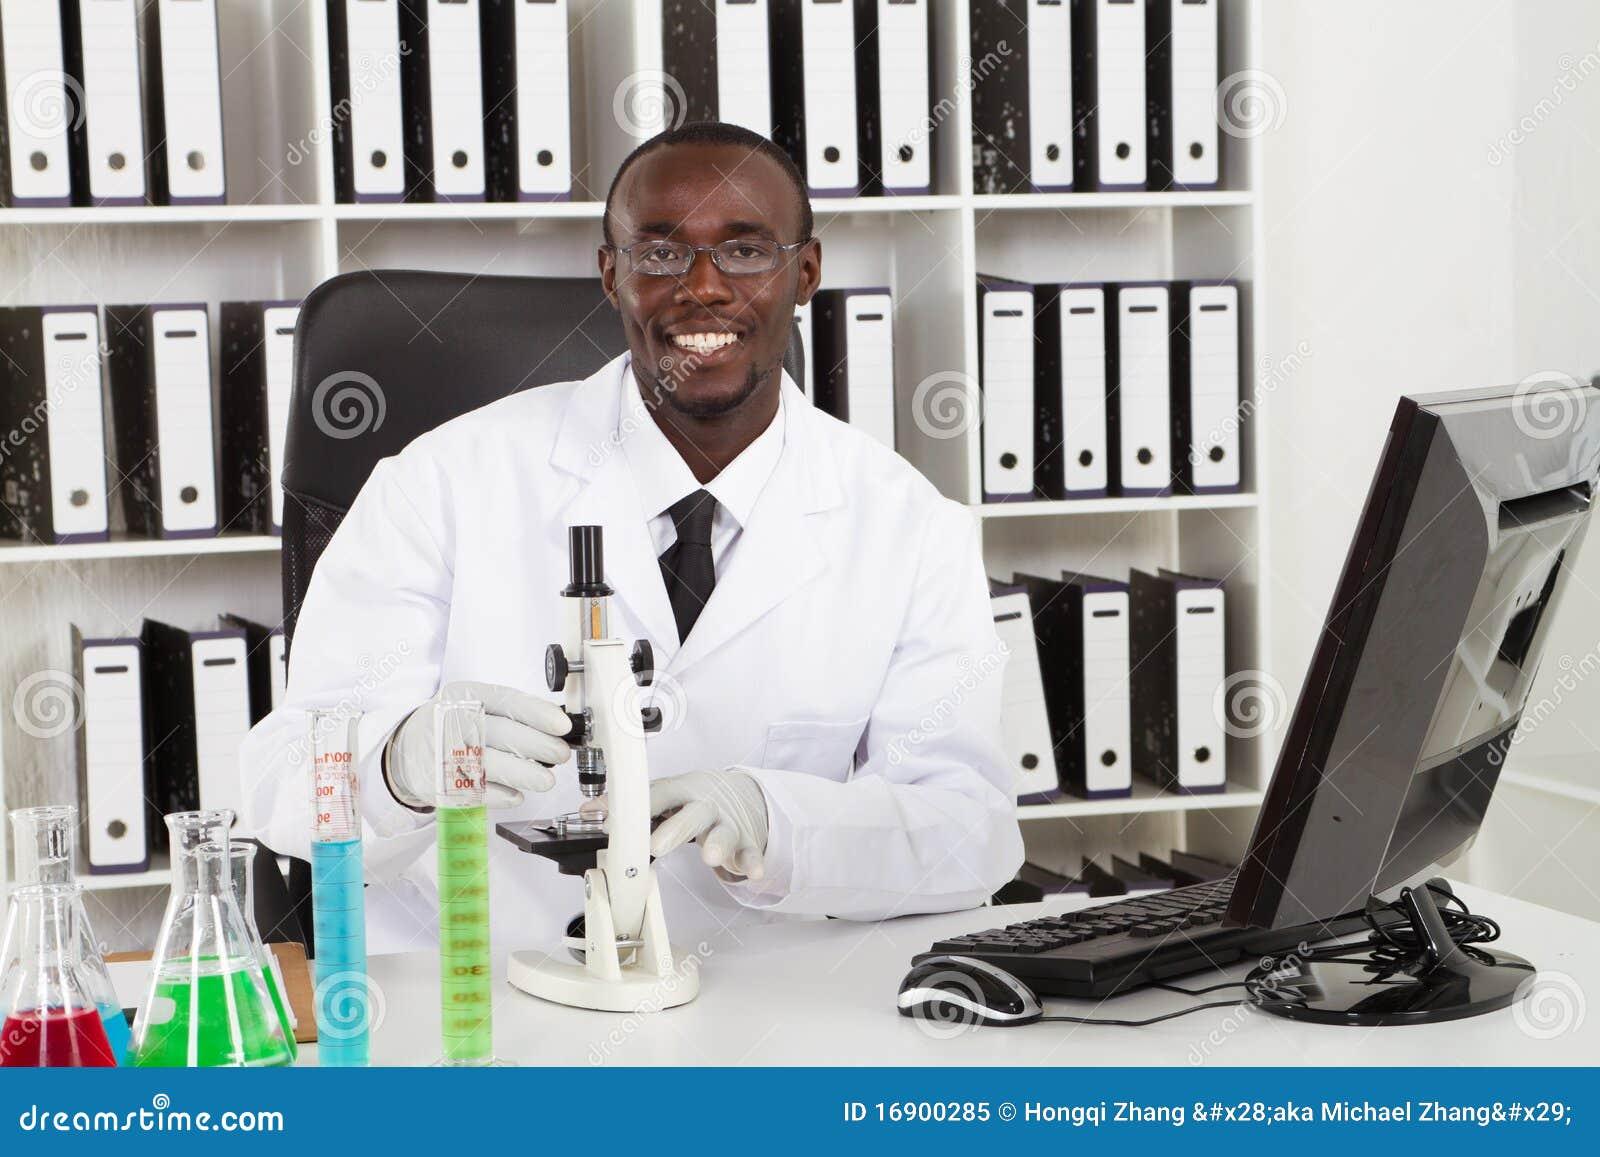 27b8f18829 Ιατρικός επιστήμονας αφροαμερικάνων που φορά το παλτό εργαστηρίων με τους  σωλήνες μικροσκοπίων και δοκιμής στο εργαστήριο. Φωτογραφία ...